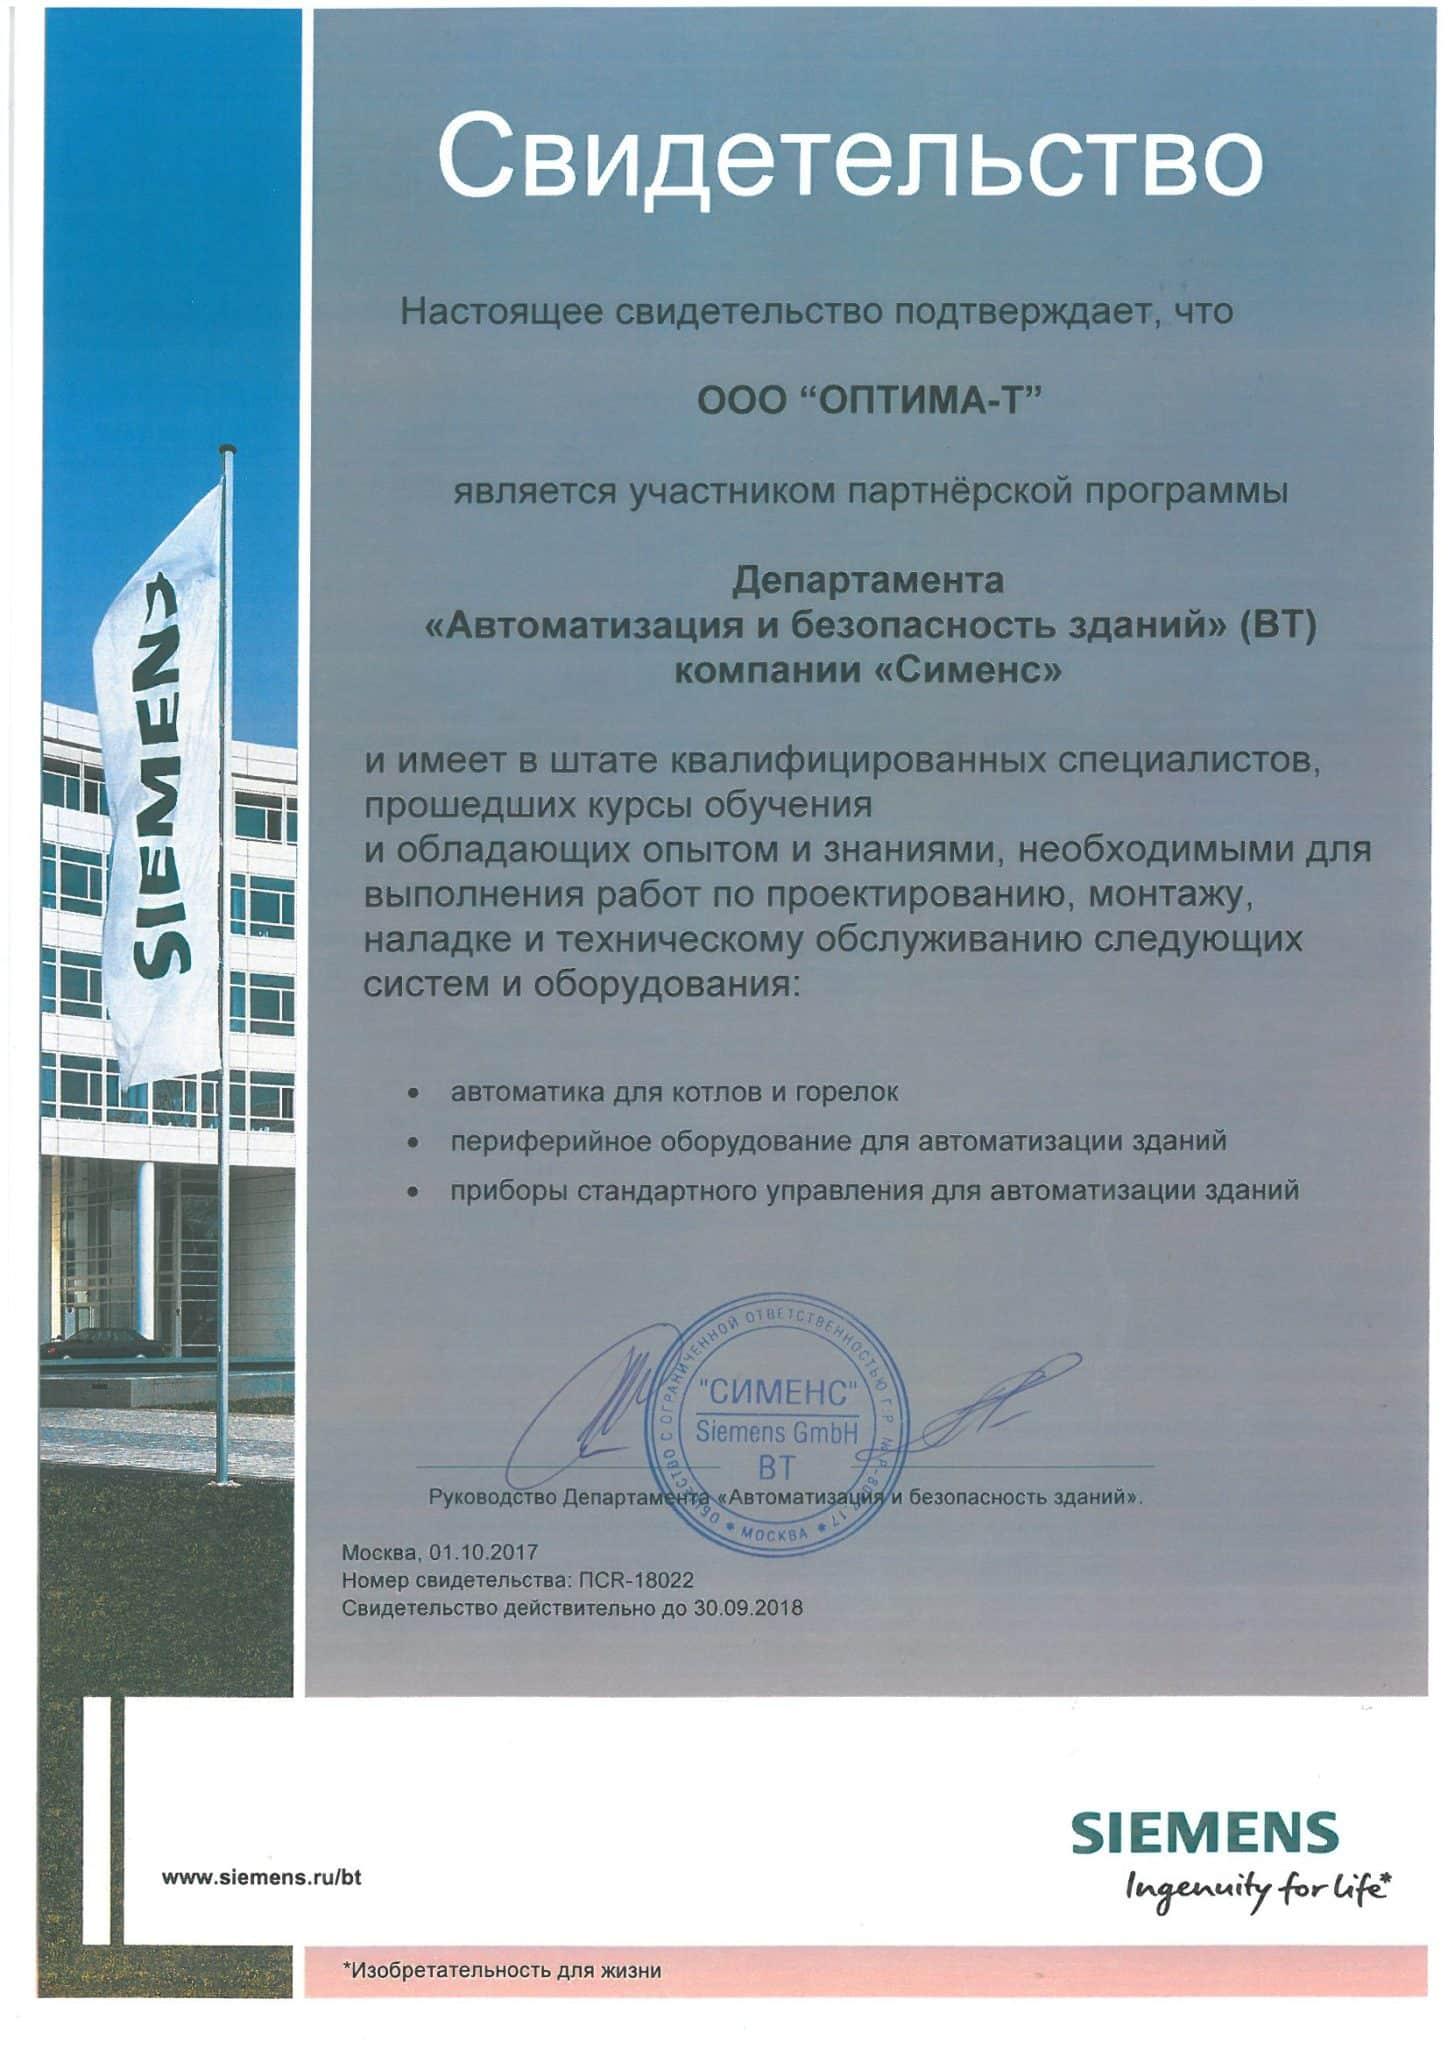 Siemens Красноярск